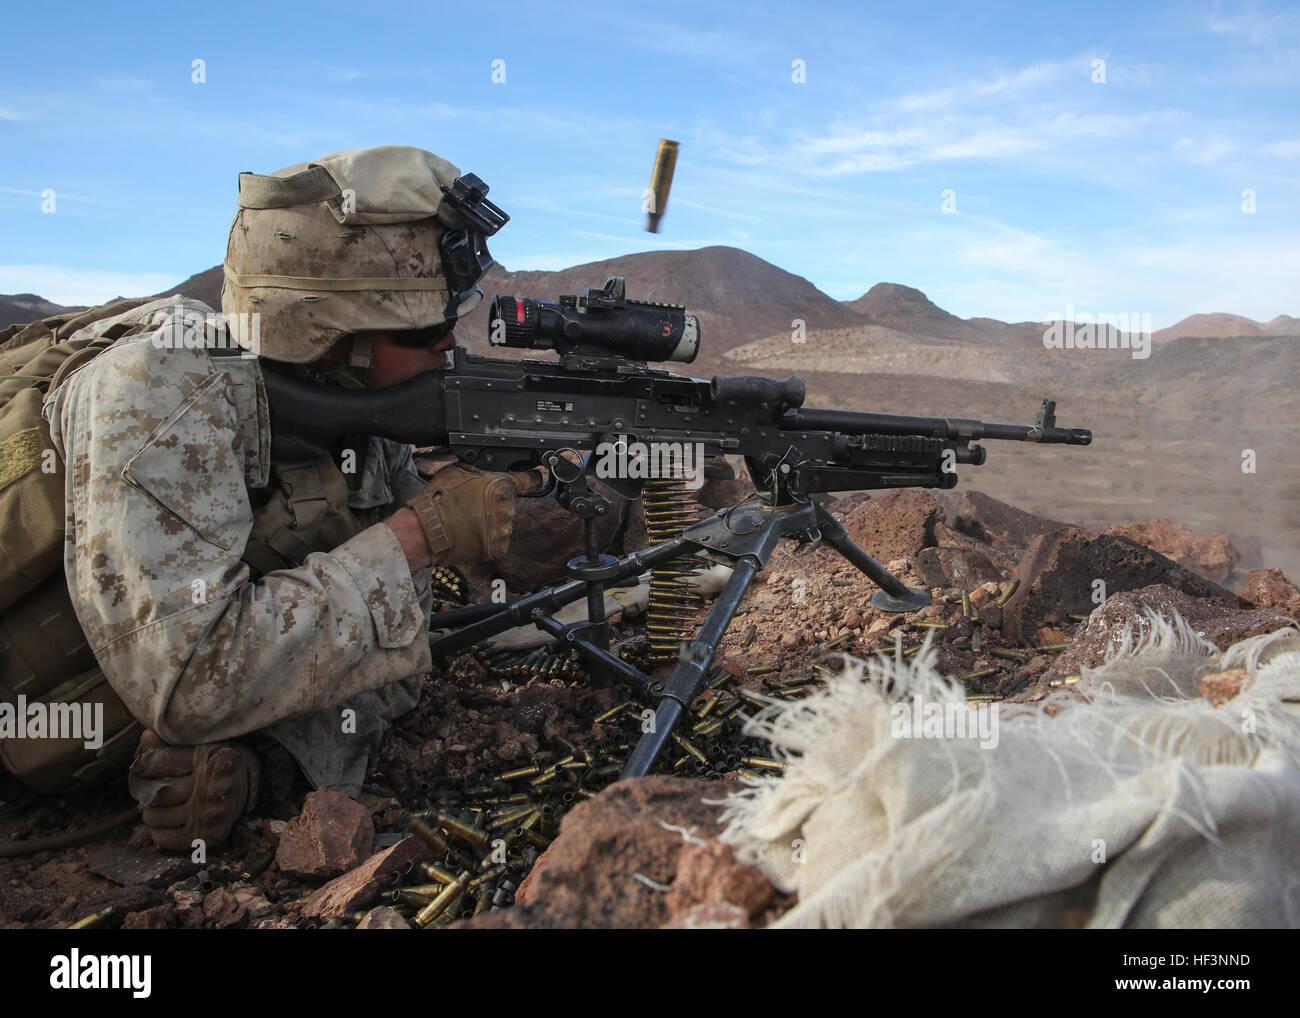 Pfc. Garrett Beck fires an M240B medium machine gun at distant targets during the company supported, live-fire assault - Stock Image